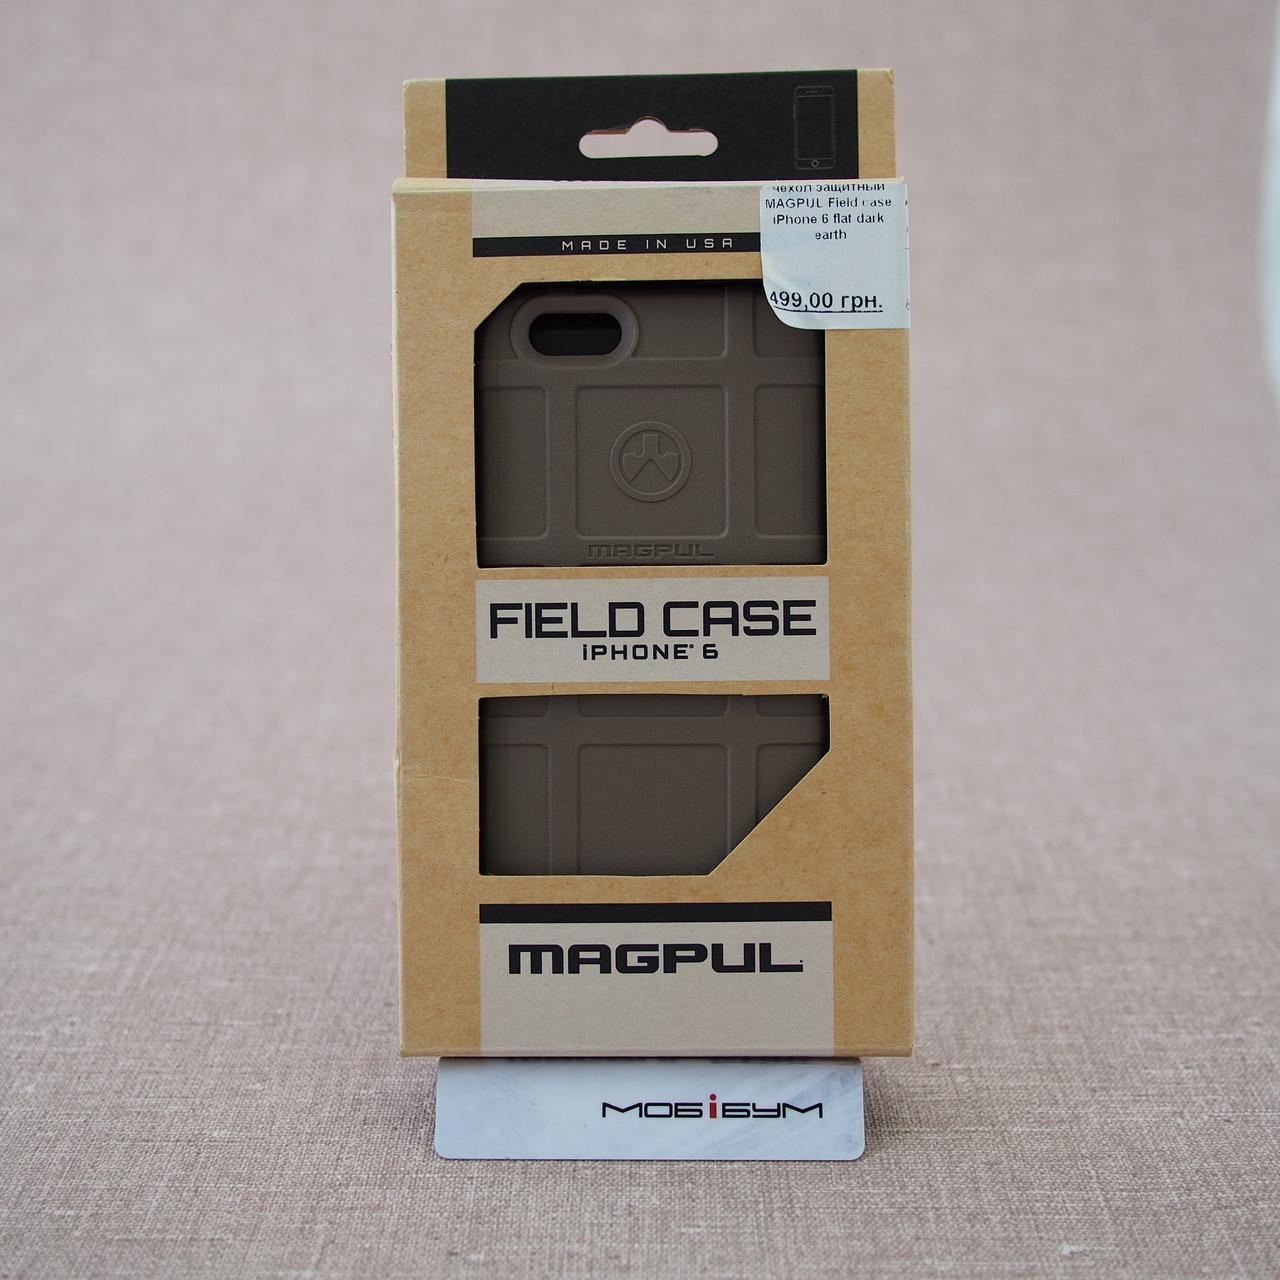 Чехол защитный MAGPUL Field case iPhone 6 flat dark e (MAG484-FDE) EAN/UPC: 840815100034